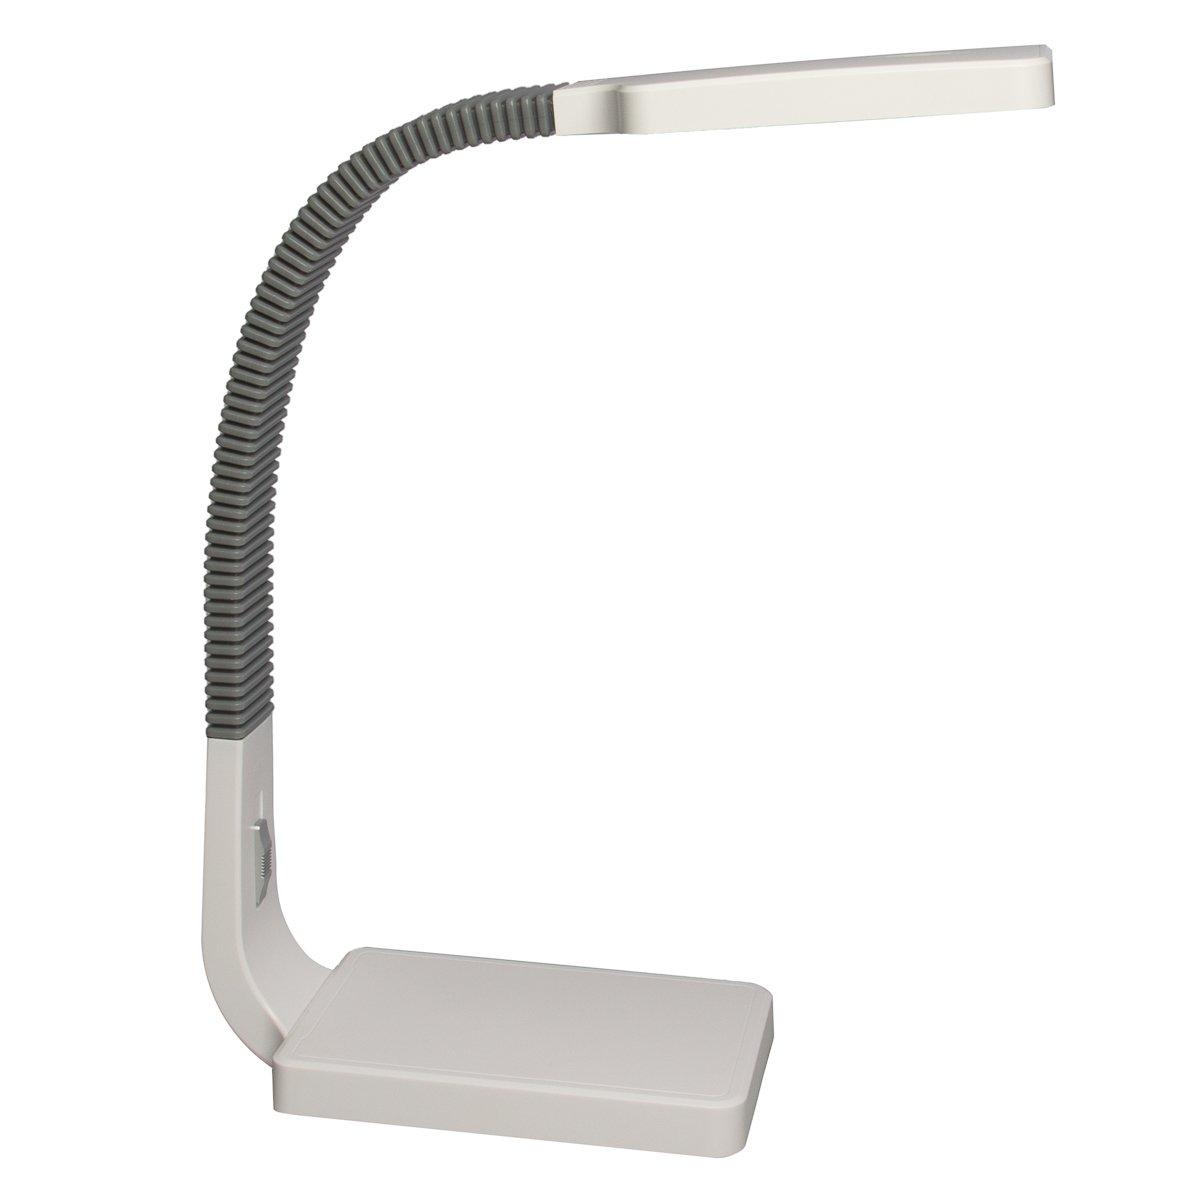 Tensor 20140-000 15.5-Inch Natural Daylight LED Gooseneck Desk Lamp with Slide Dimmer